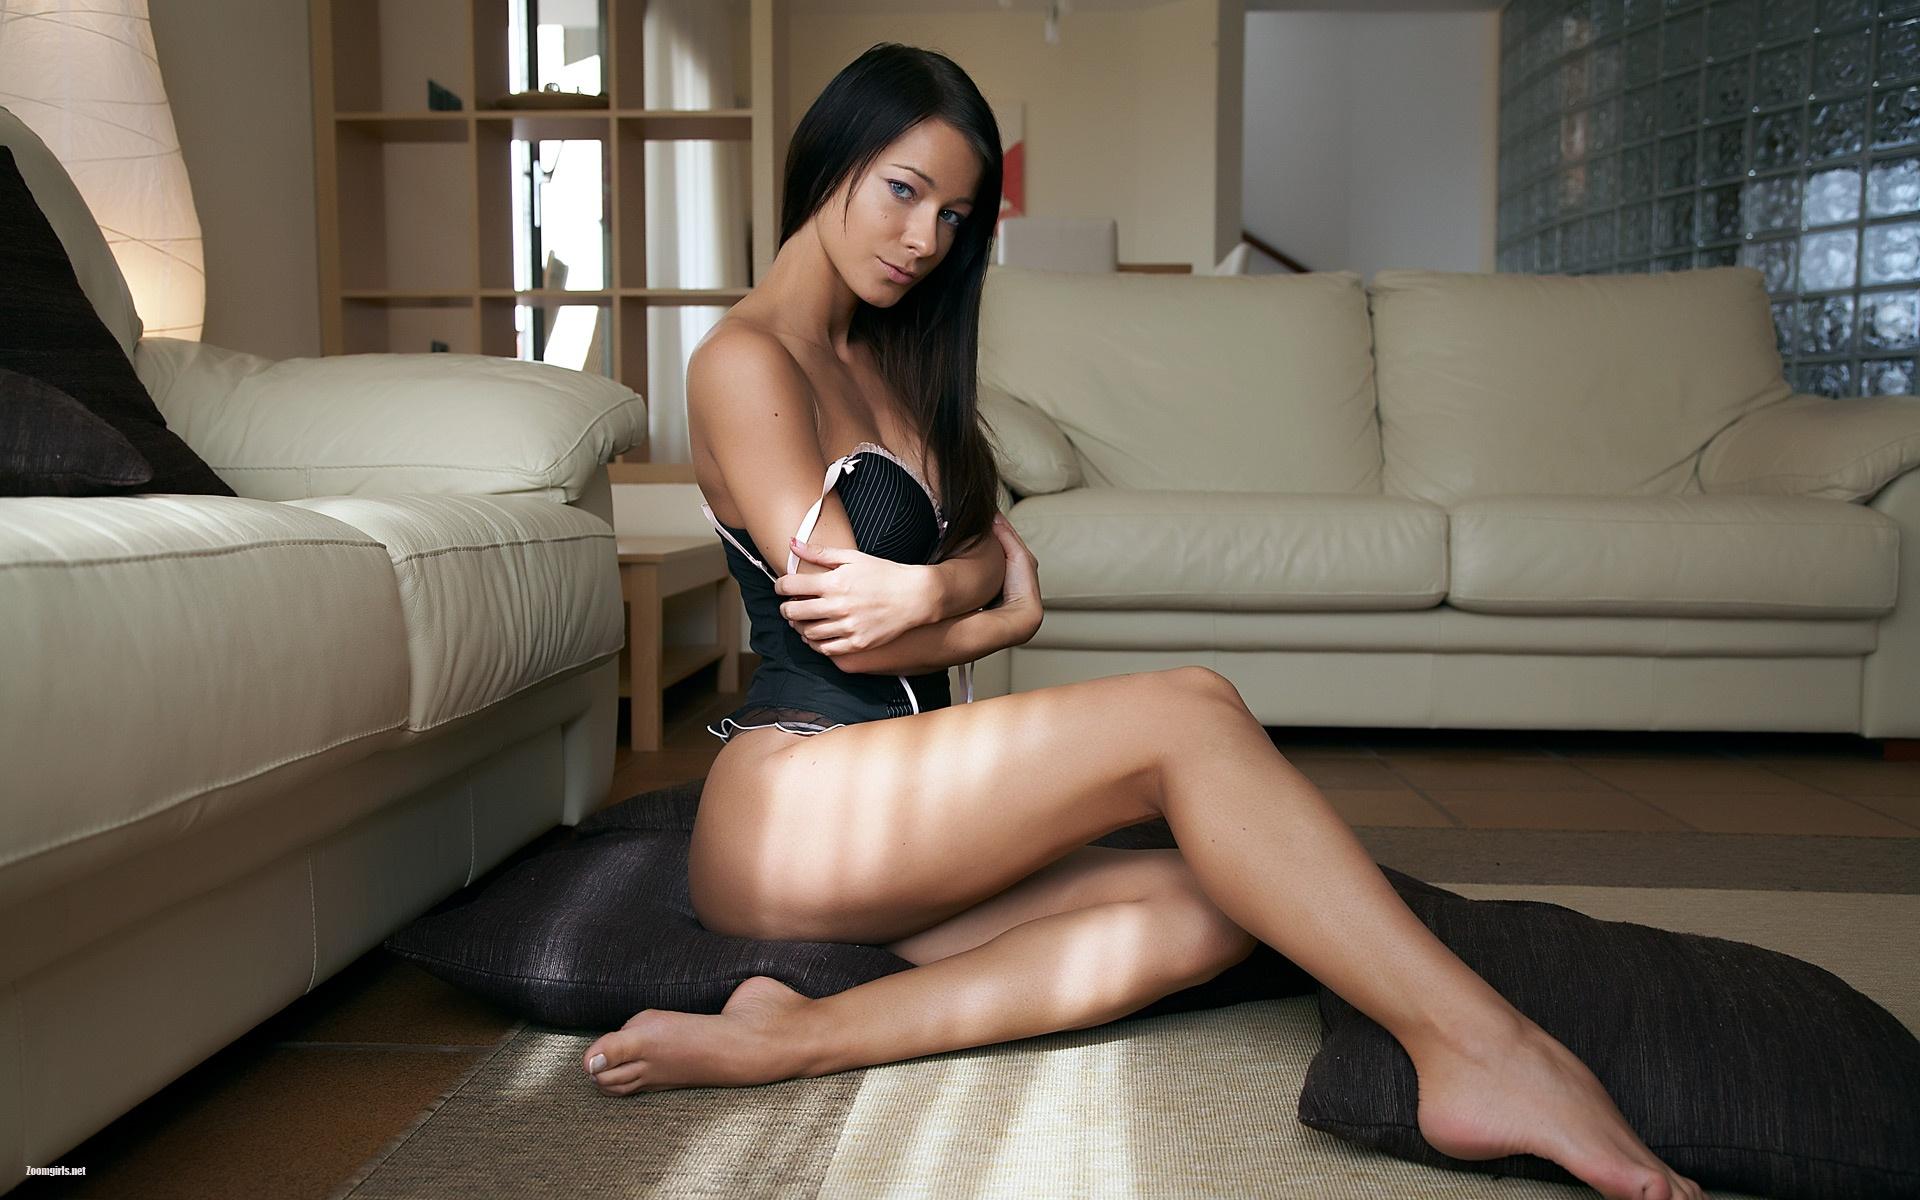 Authoritative Pornstars at home nude knows it